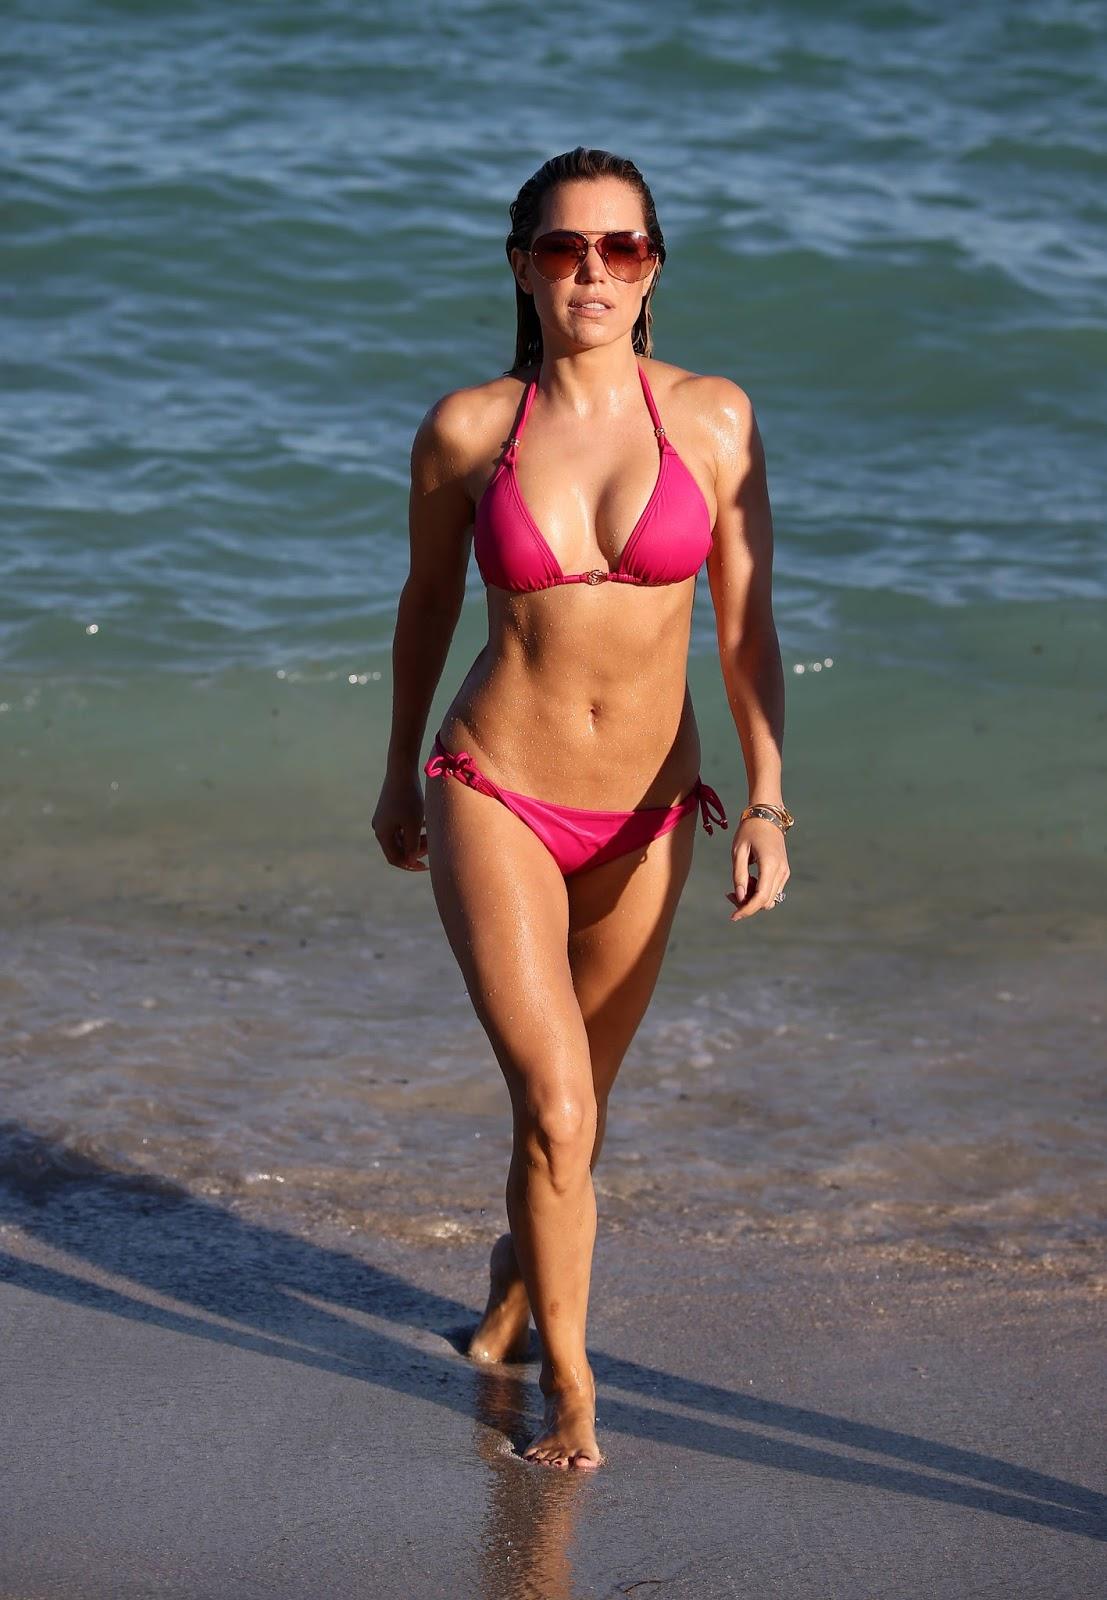 Sylvie Meis Hot Body in a Pink Bikini on the Beach